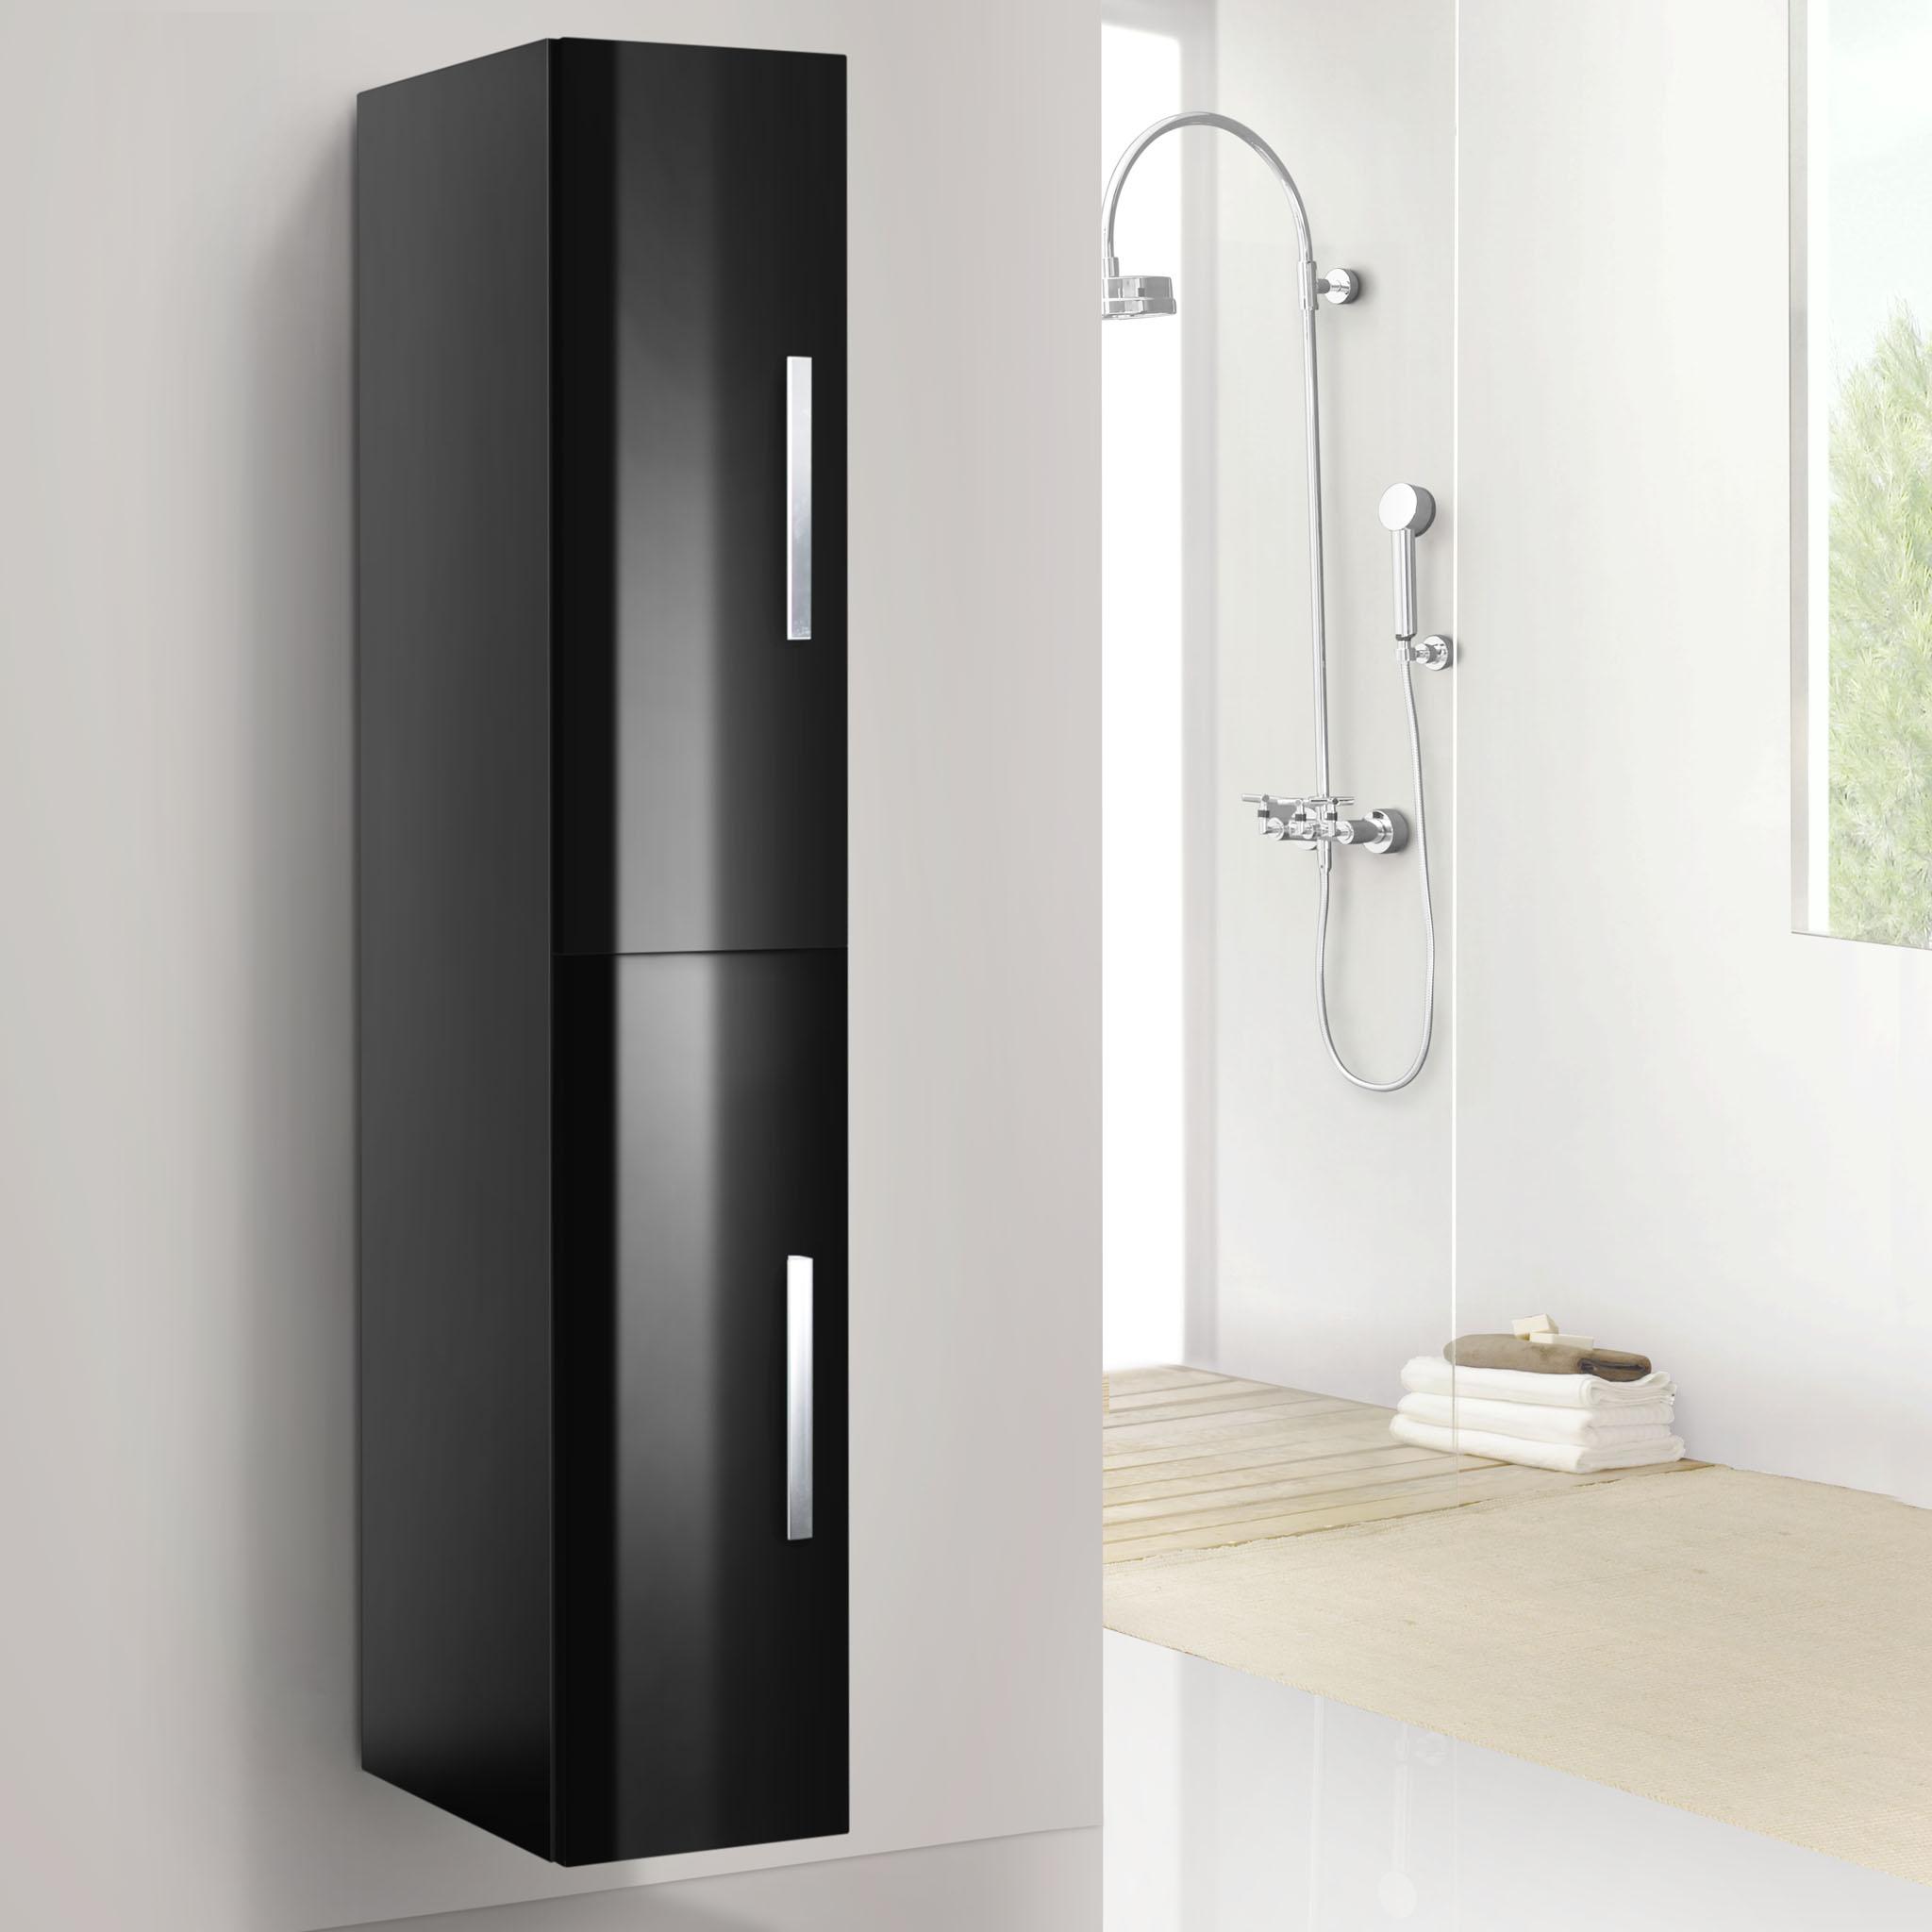 Columna auxiliar modelo plus para ba o de la mejor calidad for Mueble columna bano